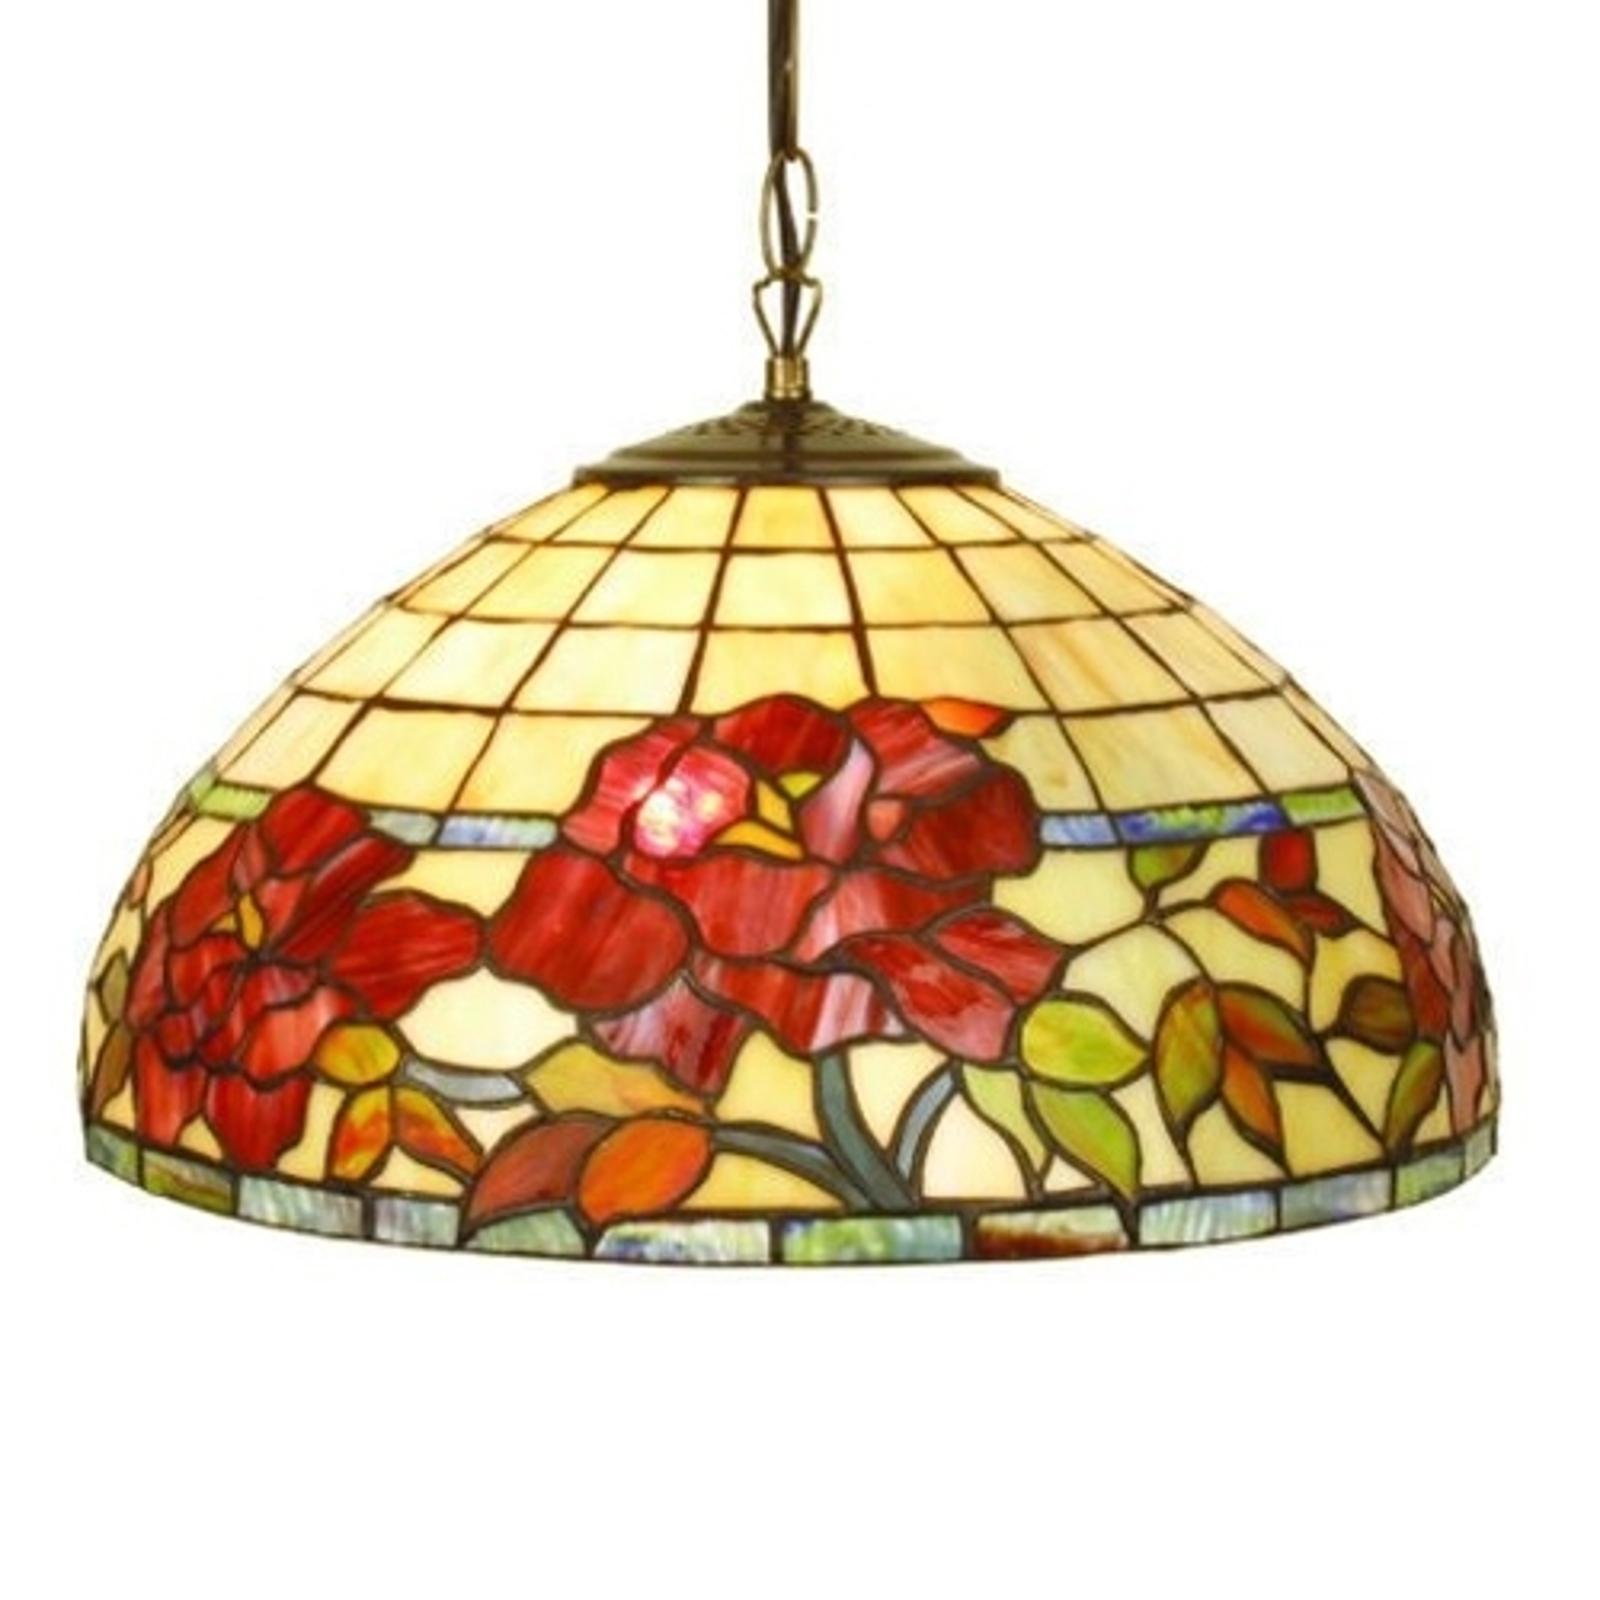 ESMEE - artistica lampada a sospensione 1 x E27